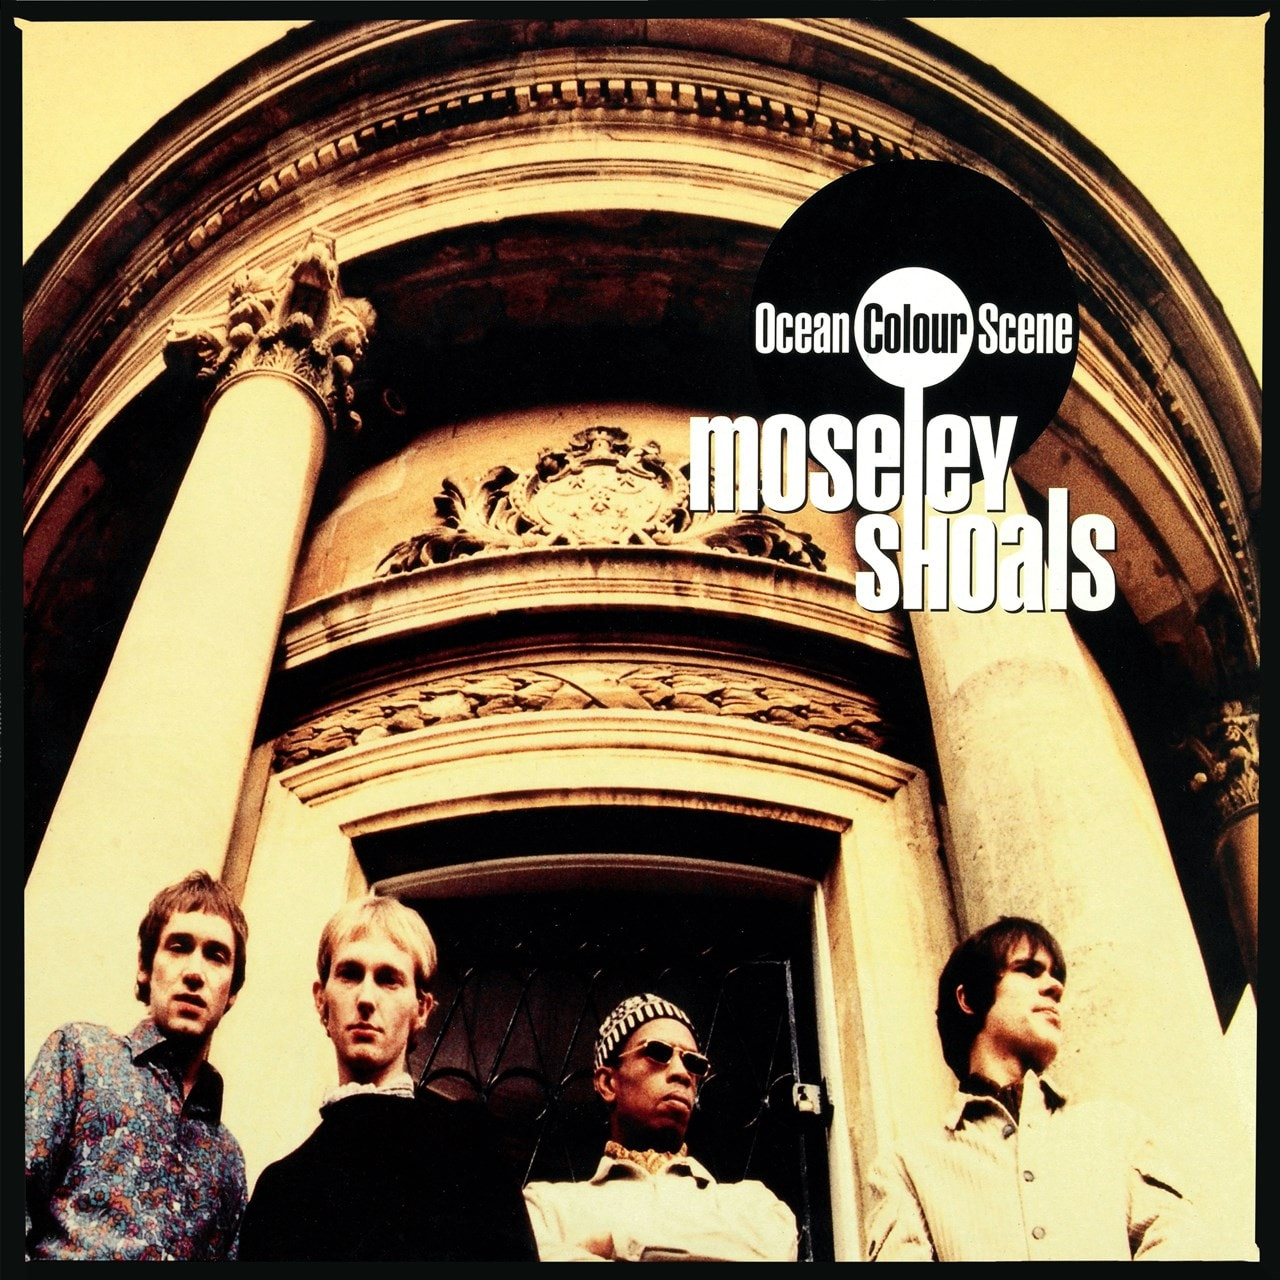 Moseley Shoals - 1